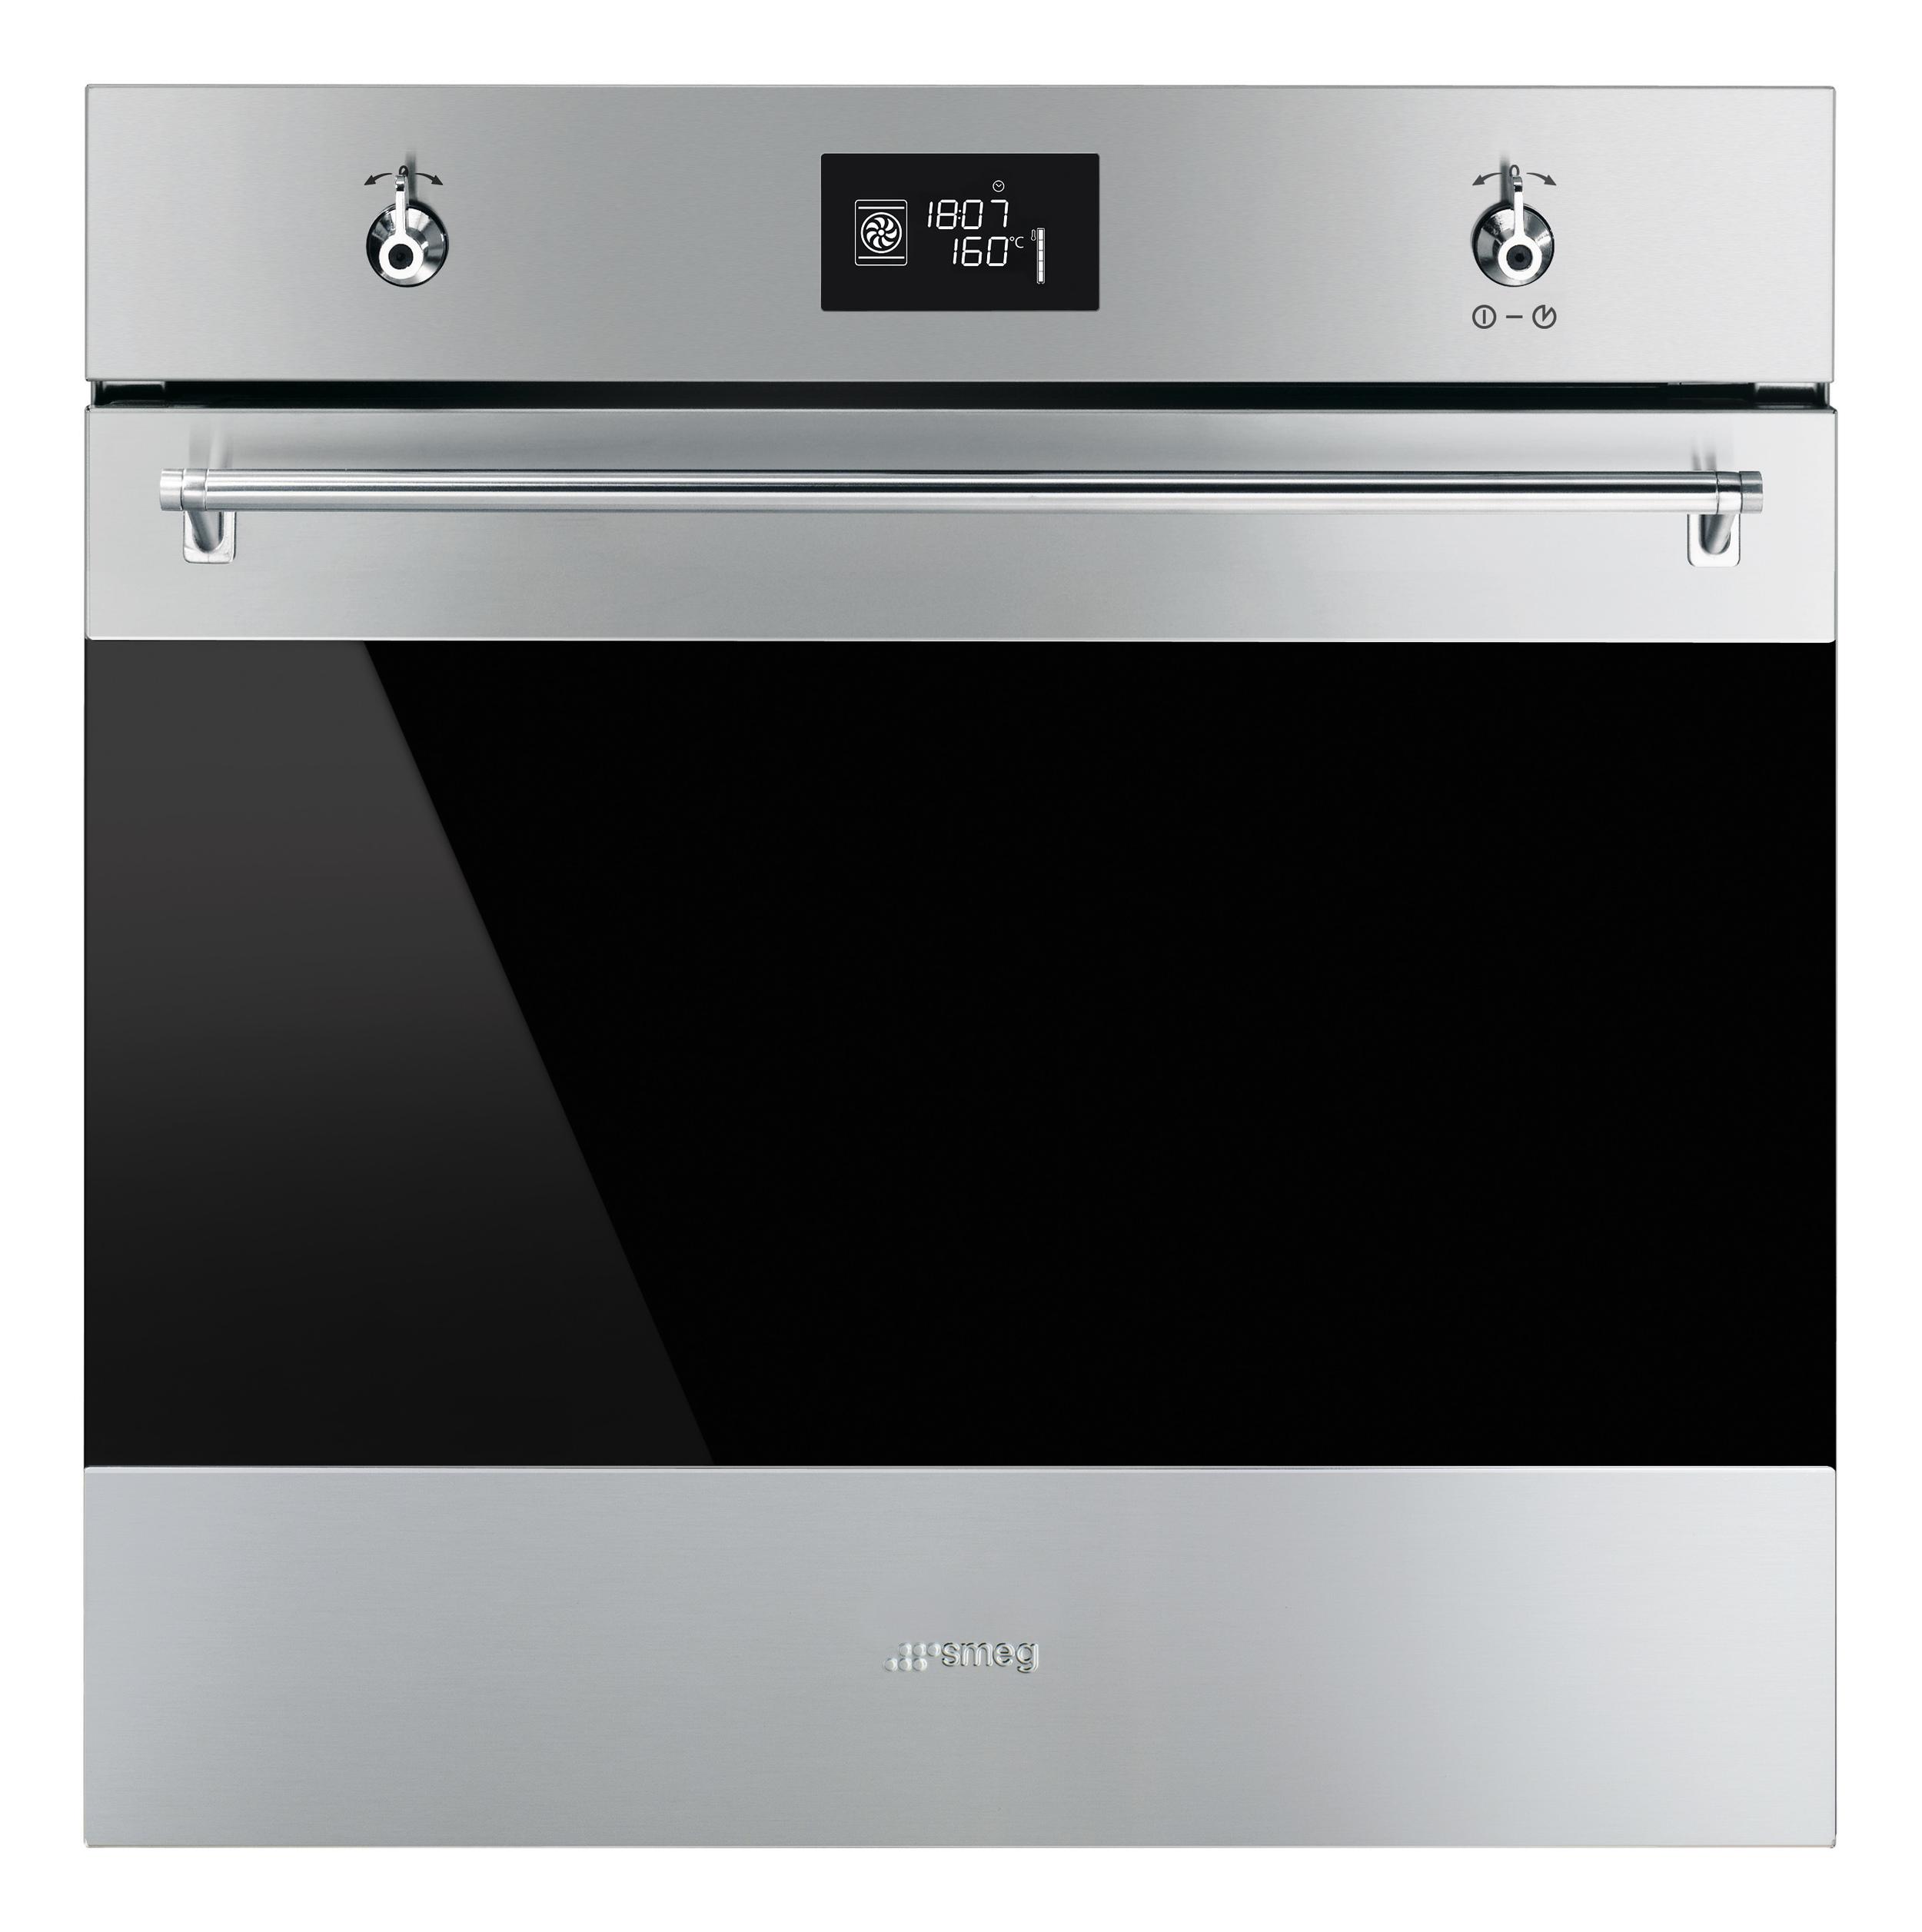 Vive-Cooking-School-Smeg-oven.jpg